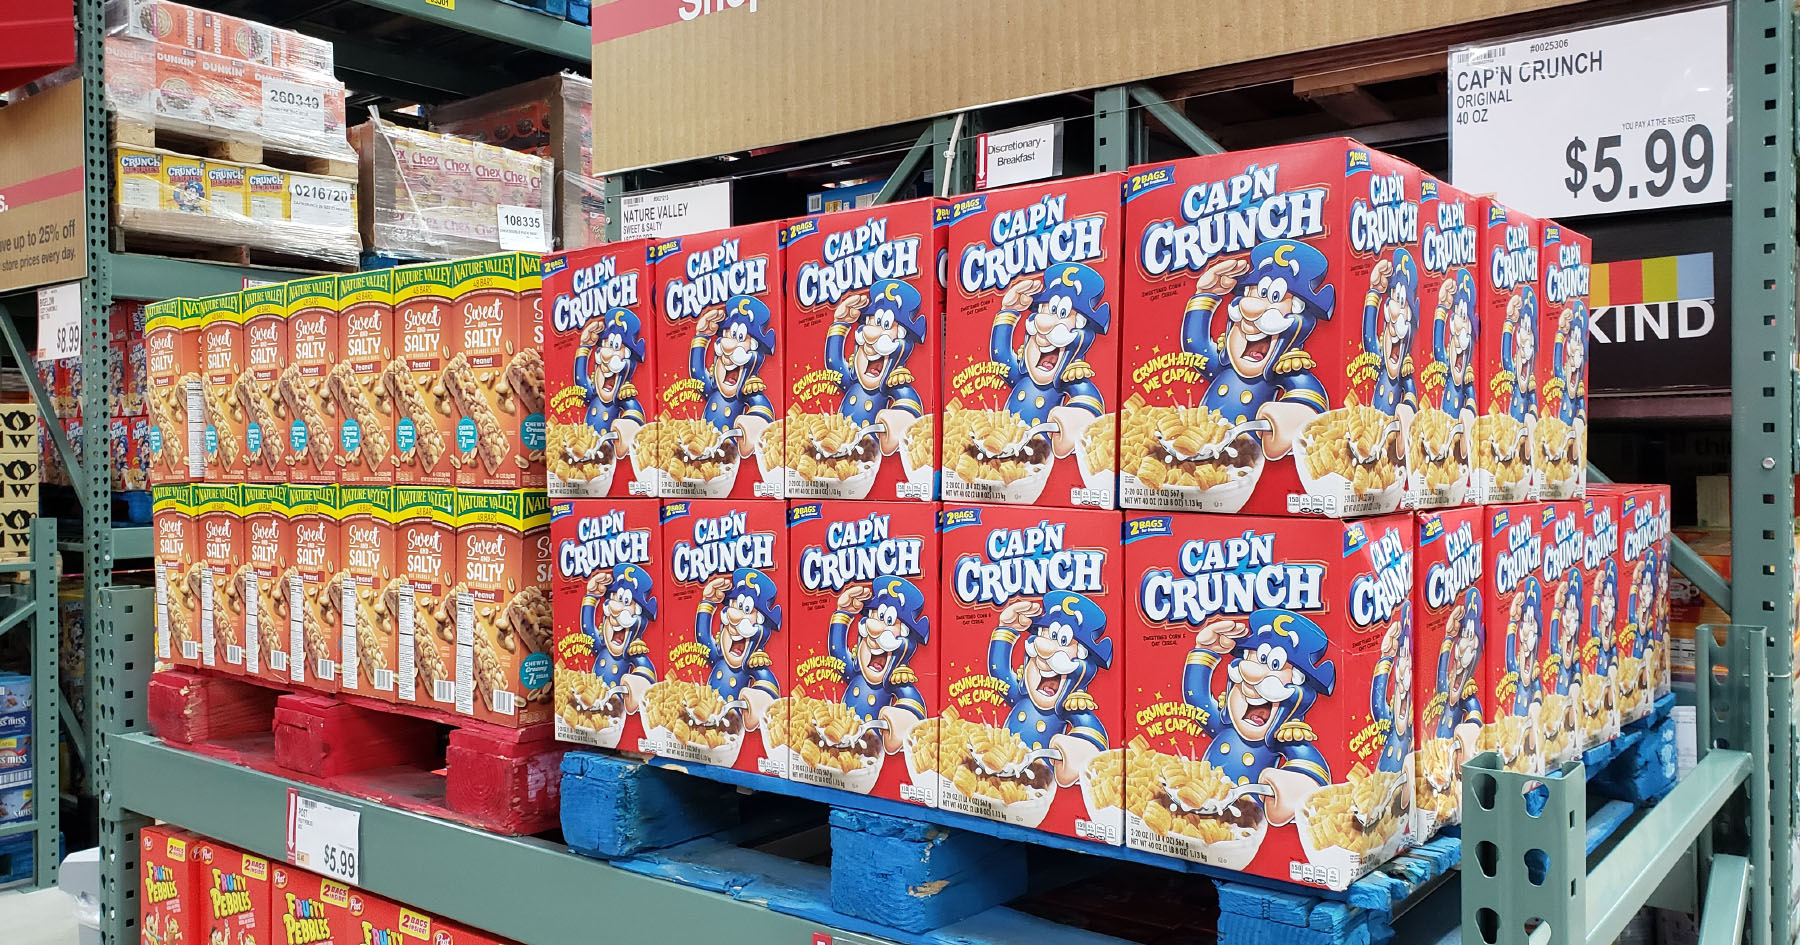 BJs Captn Crunch